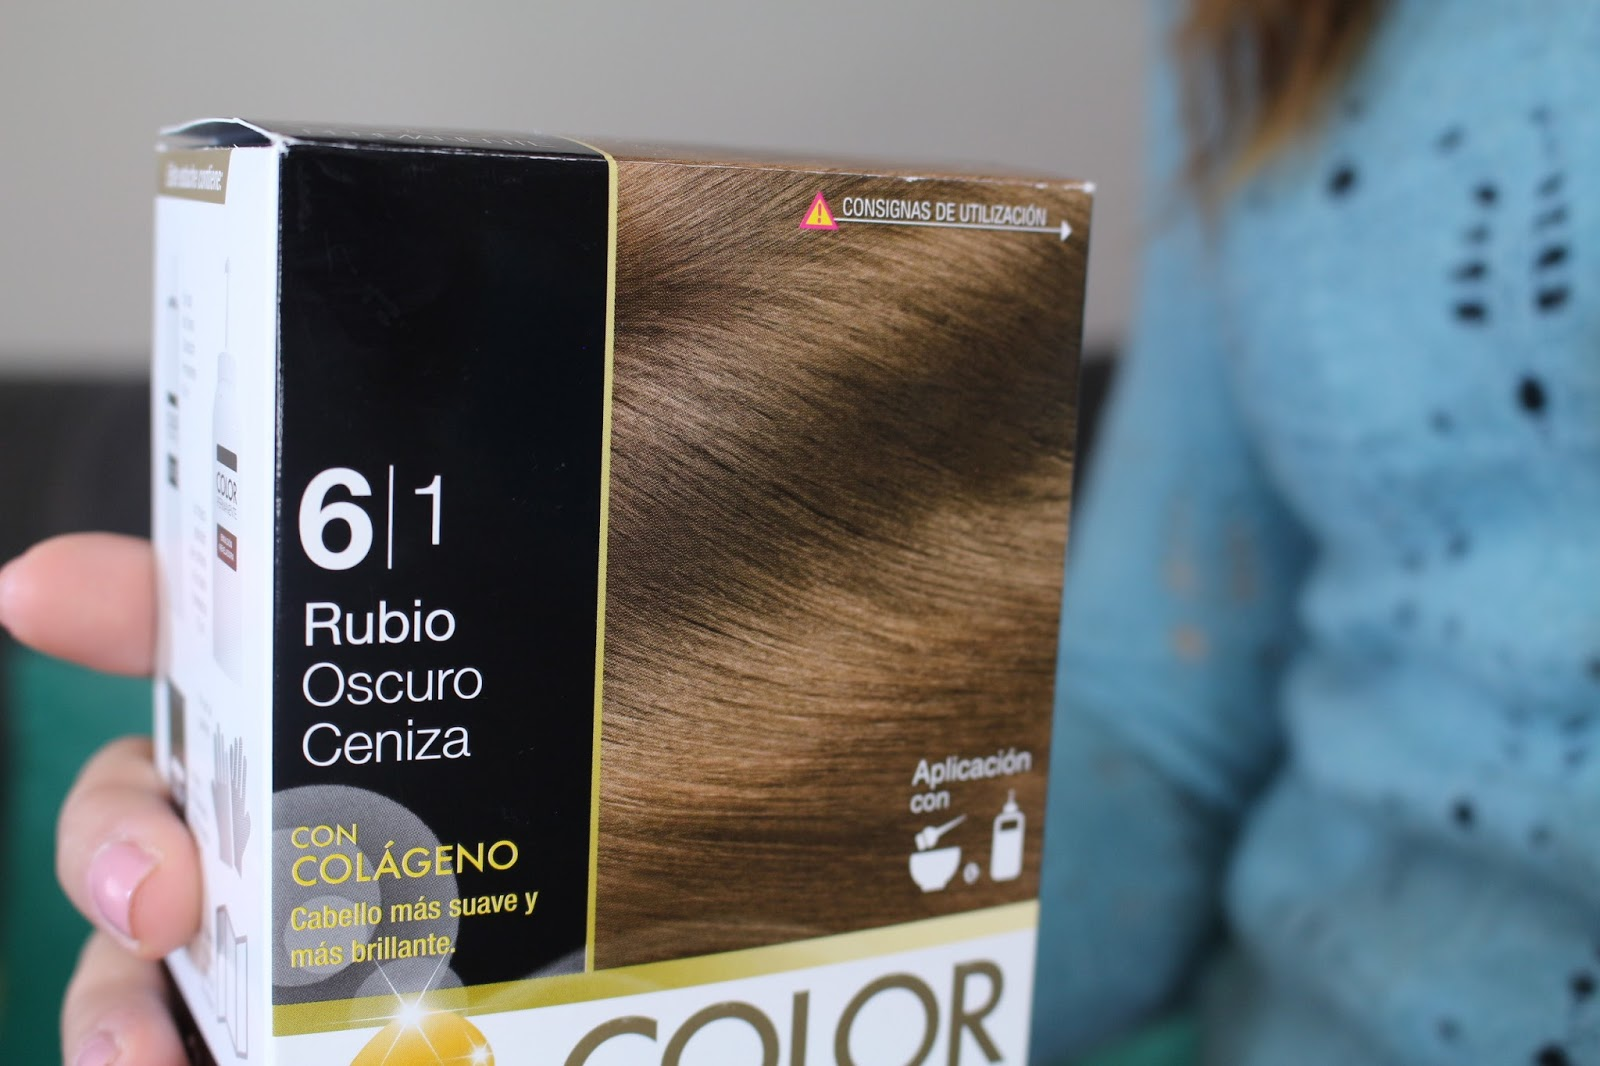 Colores de tintes para el pelo mercadona